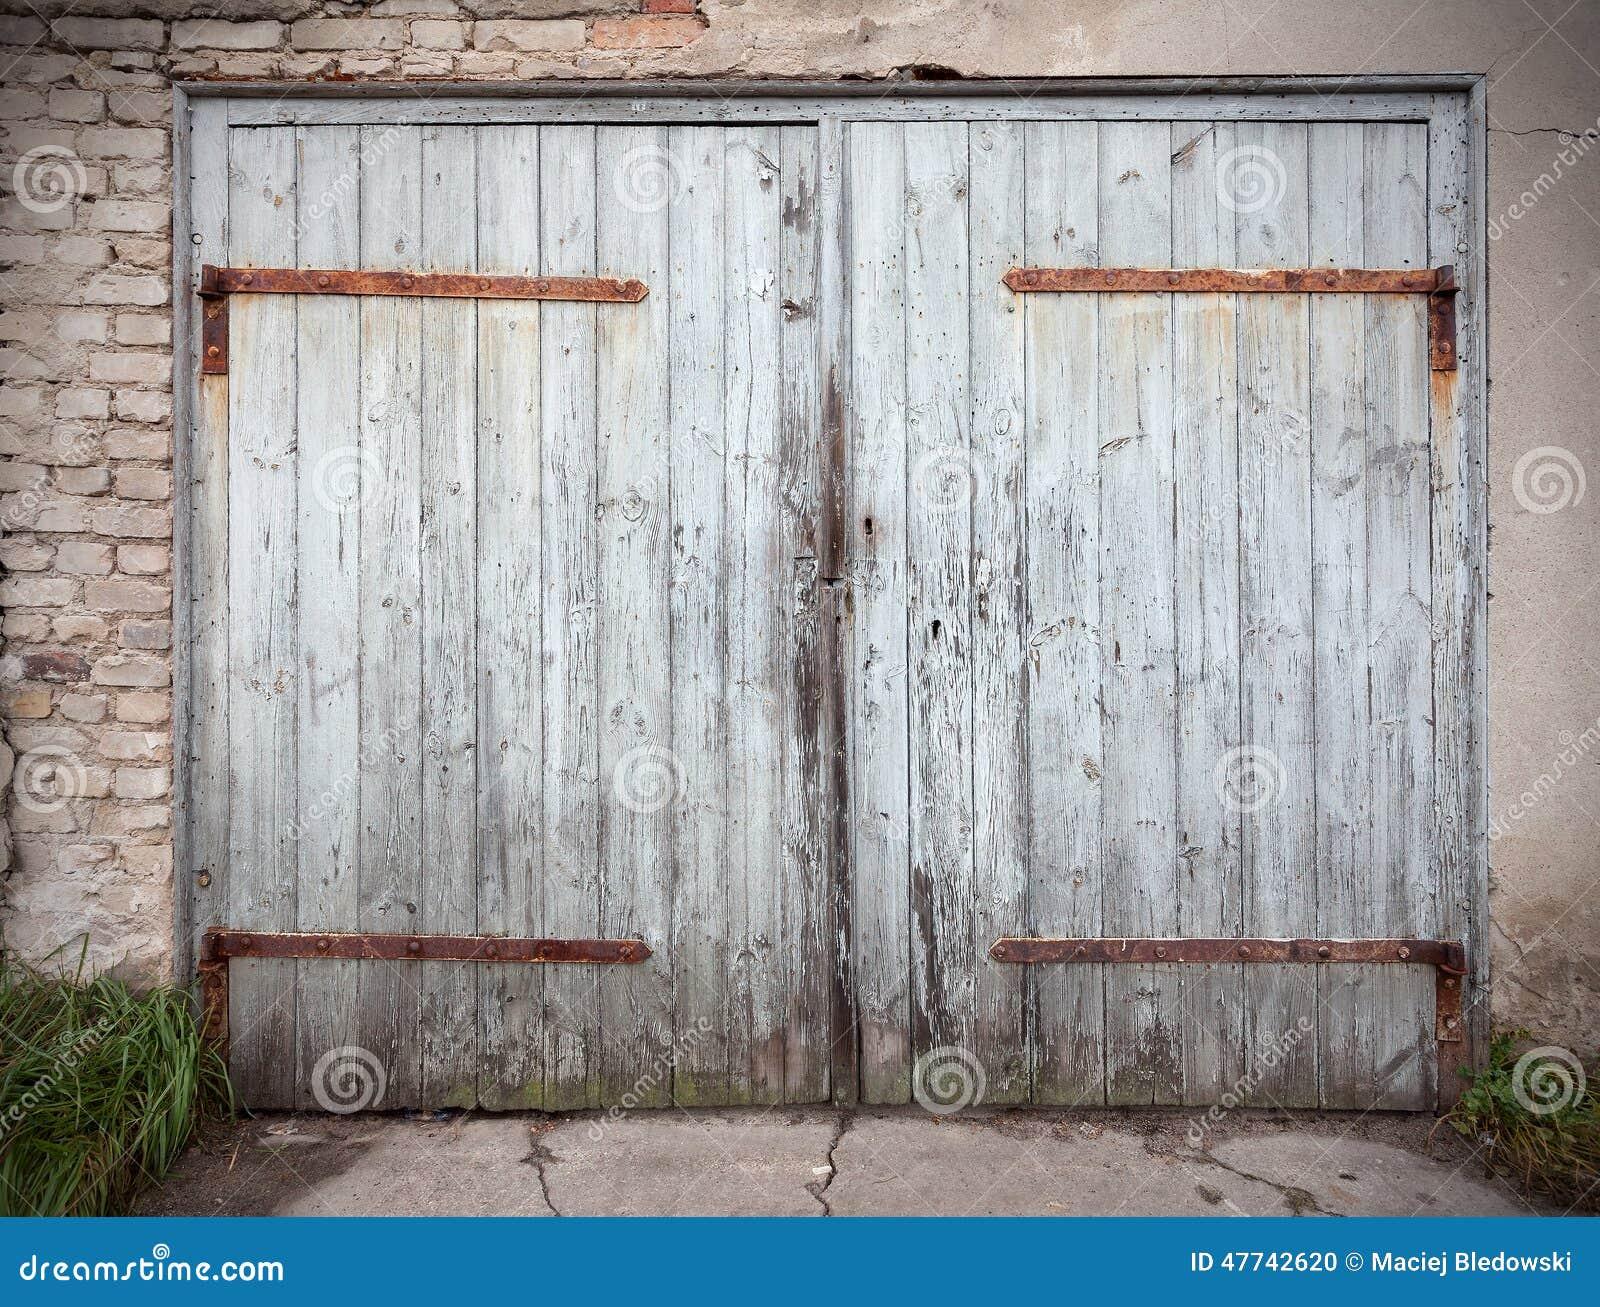 vieille porte n glig e en bois de garage photo stock. Black Bedroom Furniture Sets. Home Design Ideas